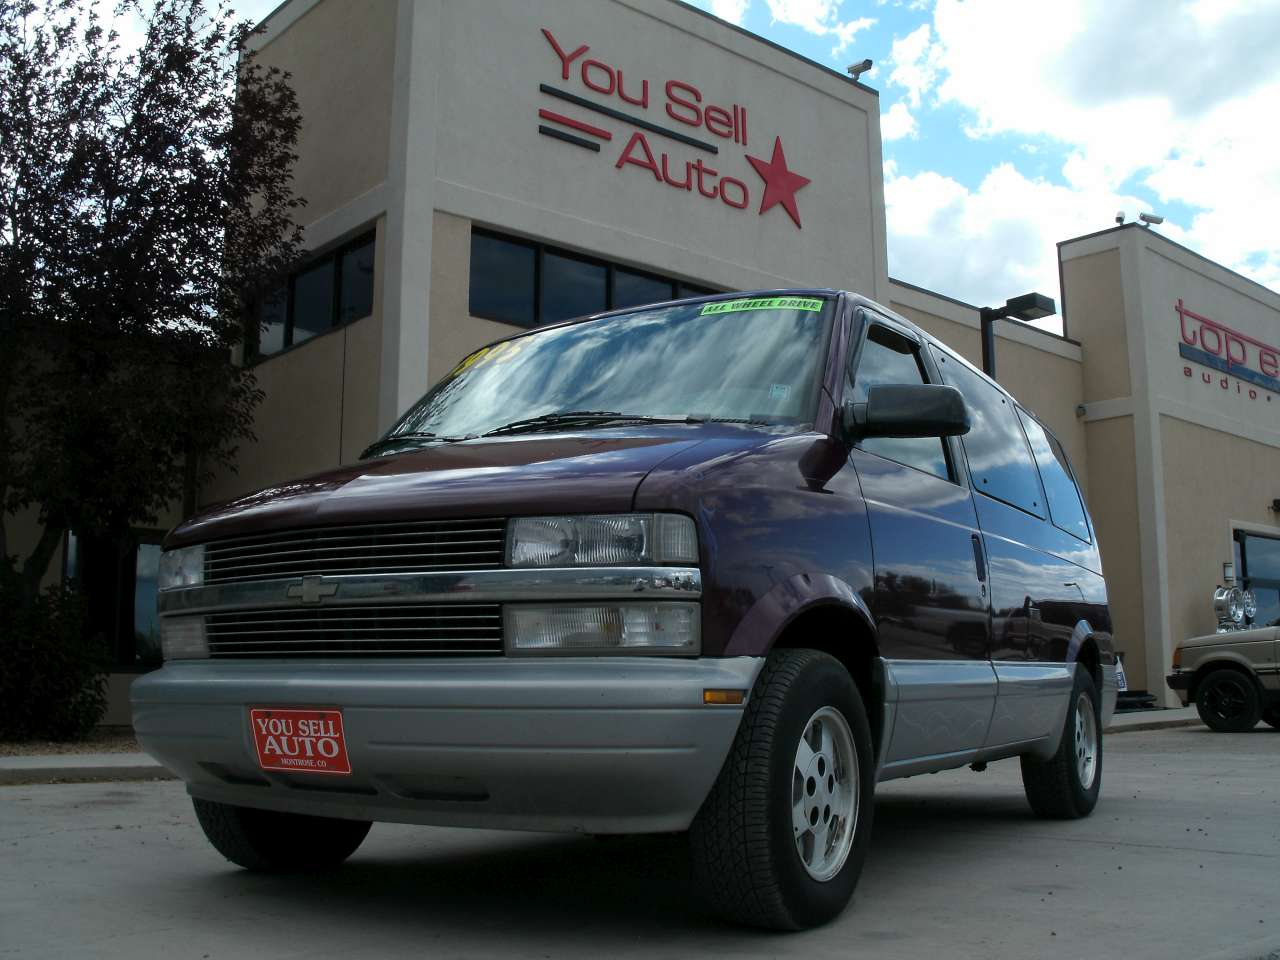 1997 chevrolet astro awd minivan 3 995 you sell auto. Black Bedroom Furniture Sets. Home Design Ideas